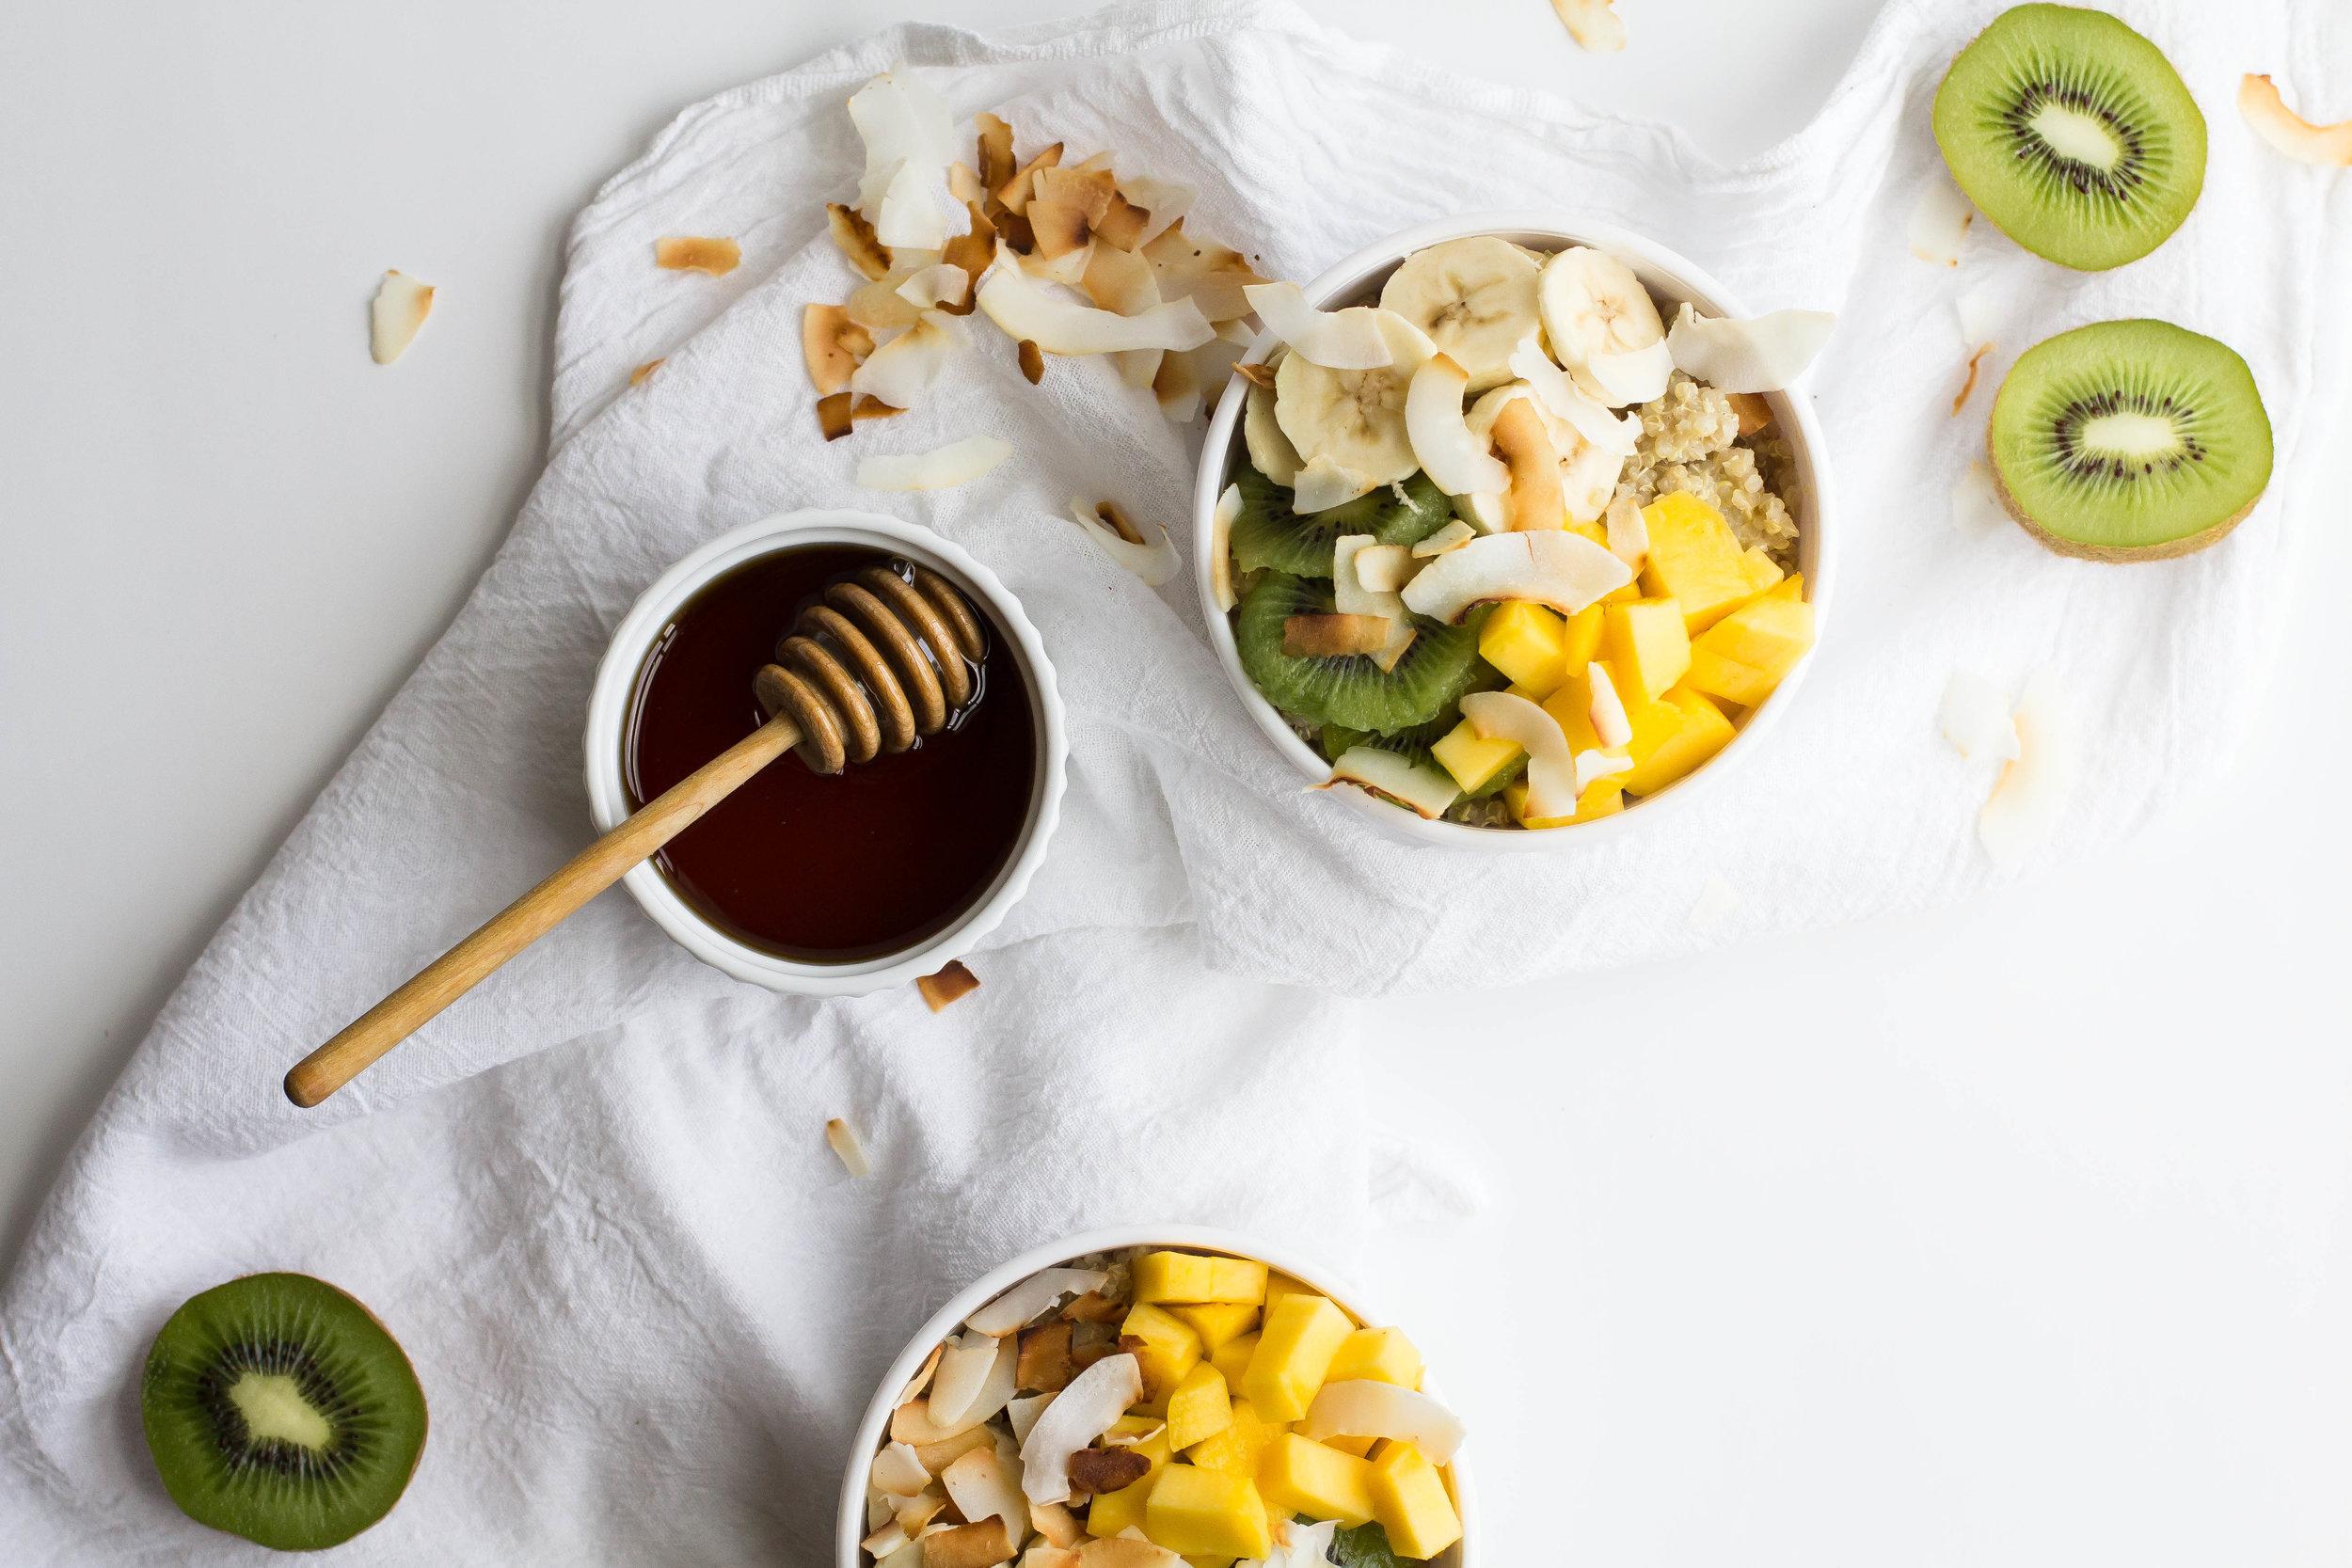 Tropical Quinoa Breakfast Bowl - Sarah J. Hauser